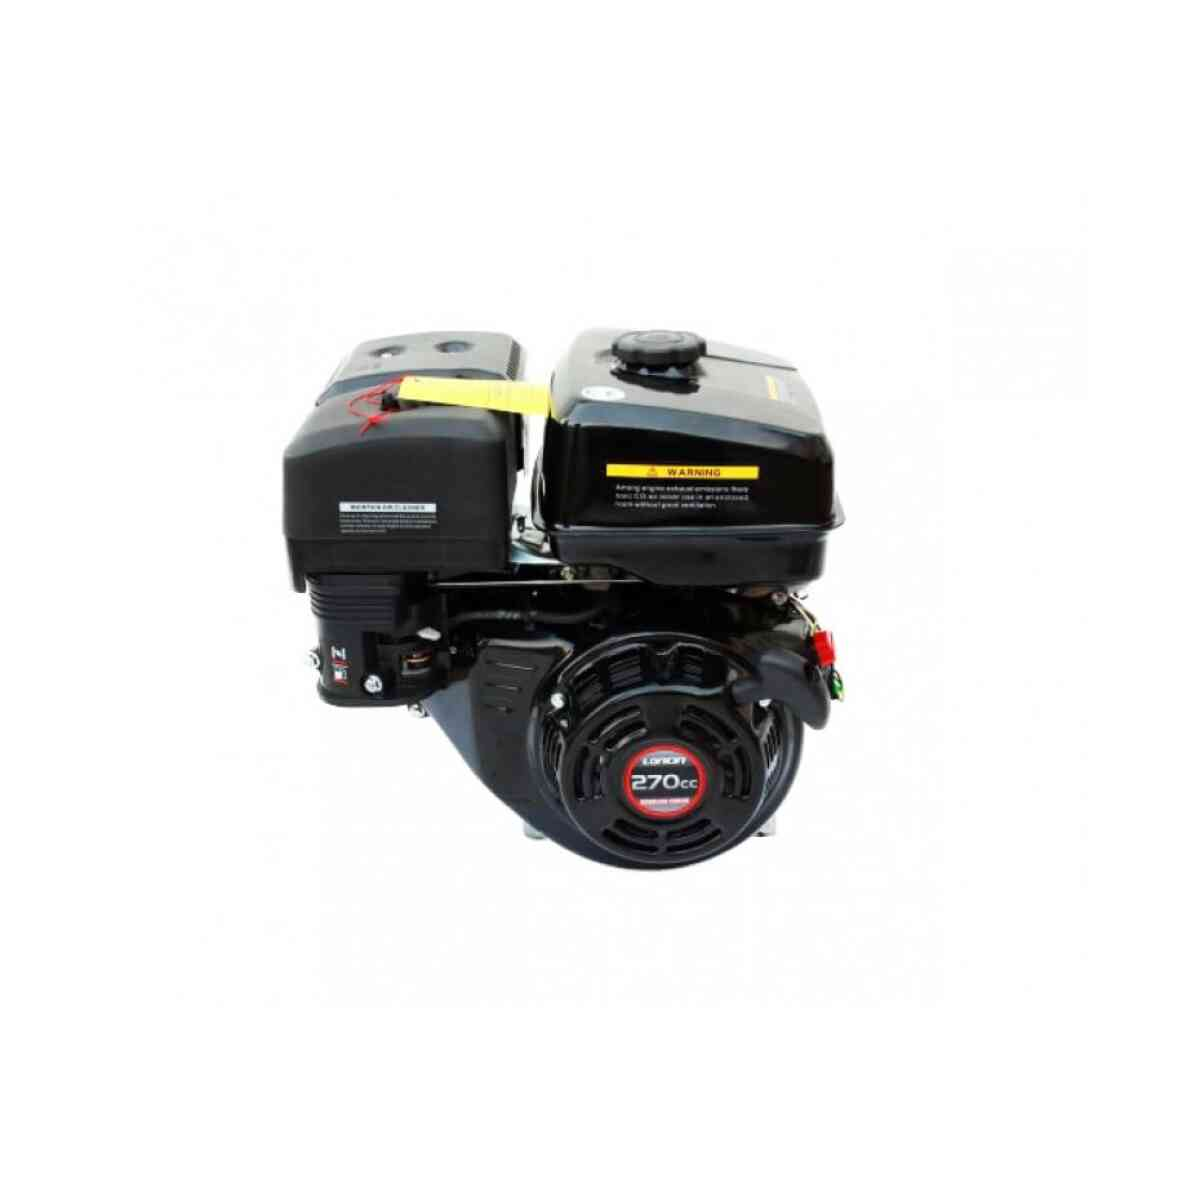 motor loncin 9cp ax conic g270f g padure gardina.ro 35